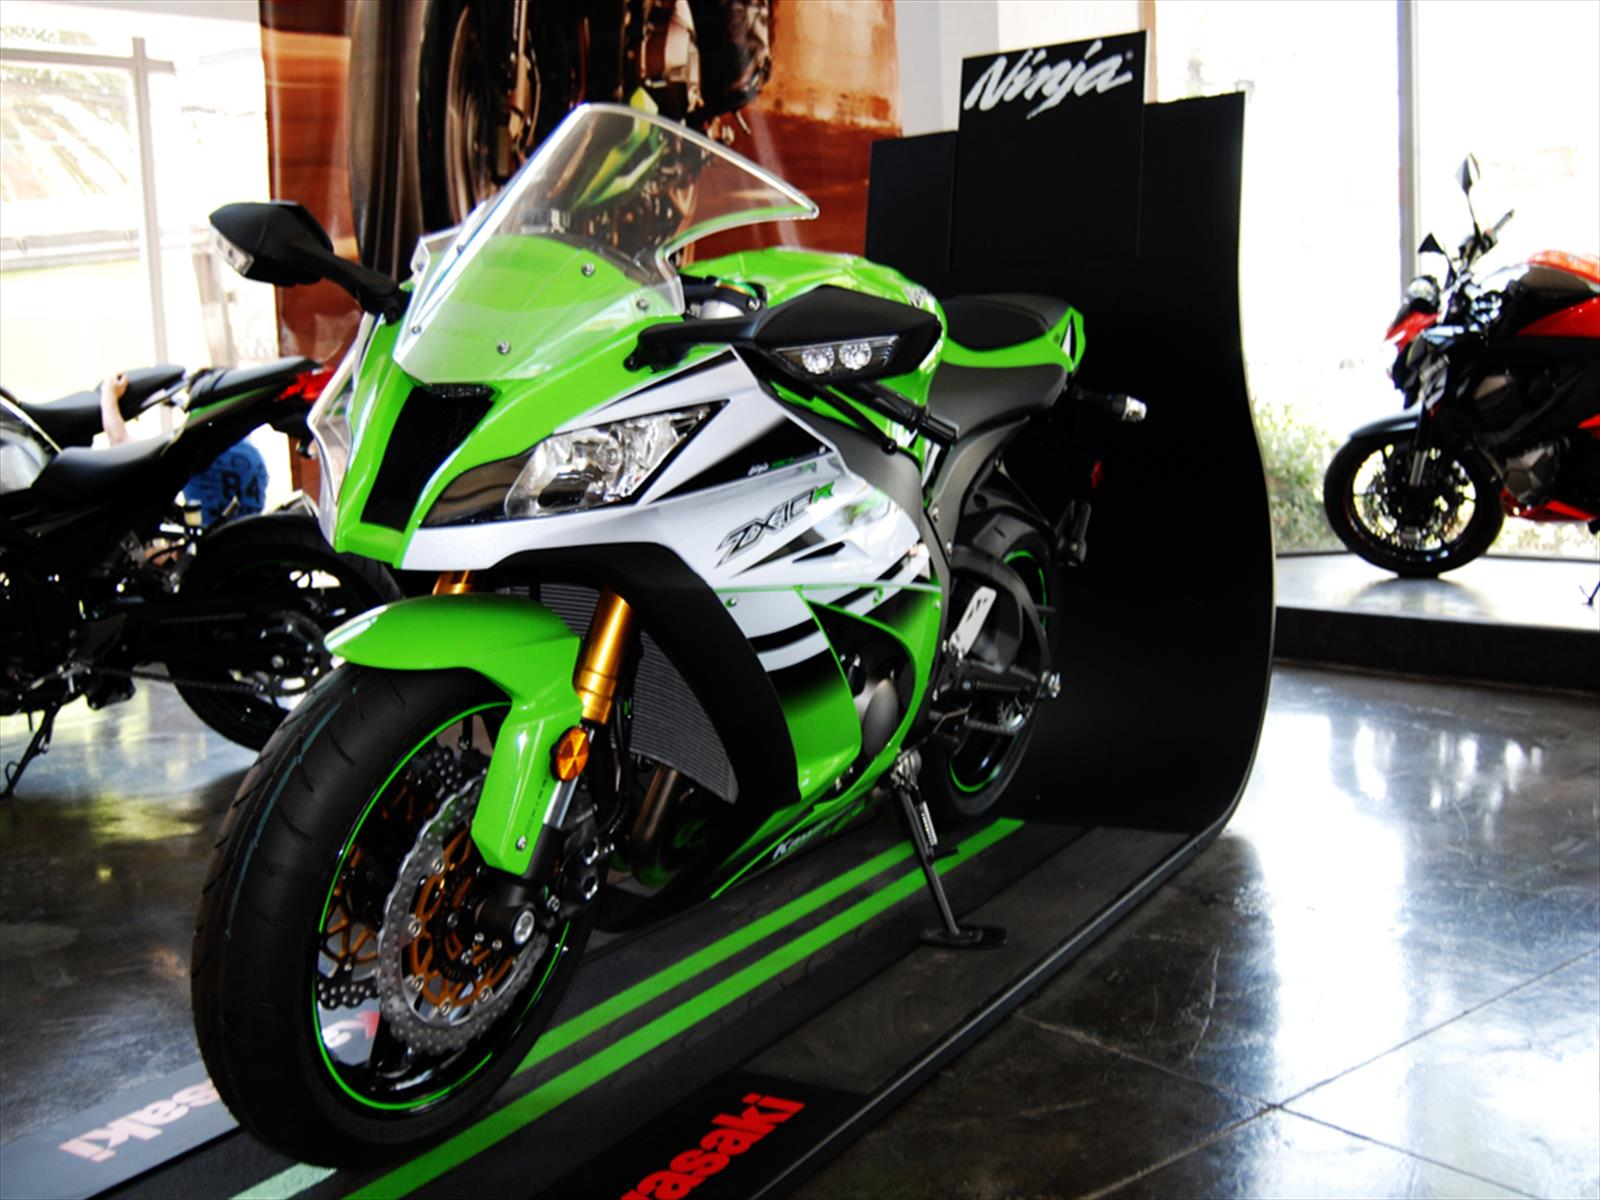 Kawasaki Ninja 30 – Idea di immagine del motociclo